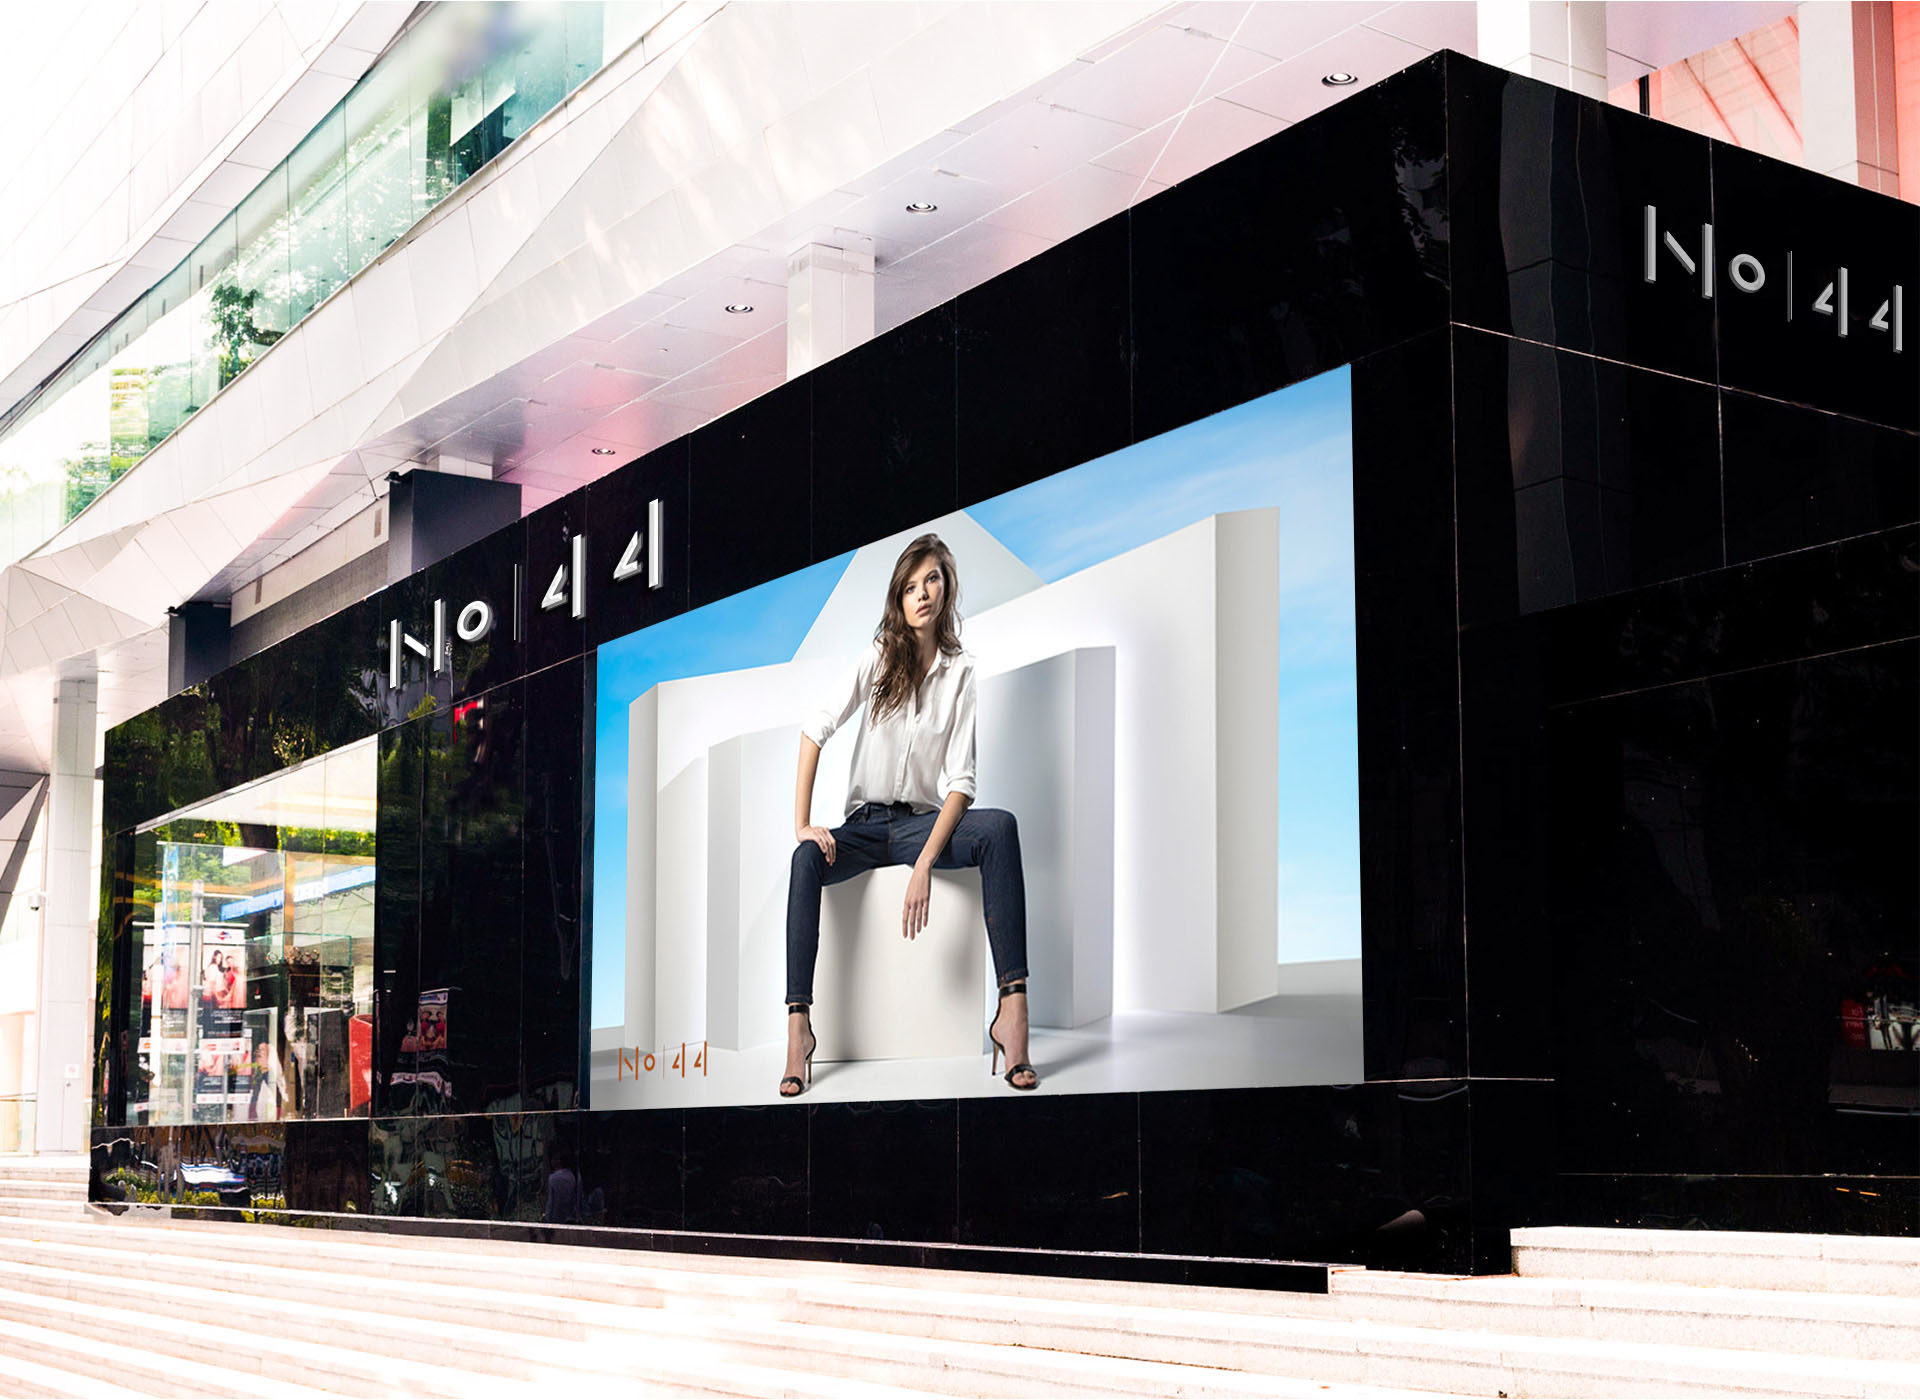 NO44 portofoliu inoveo storefront